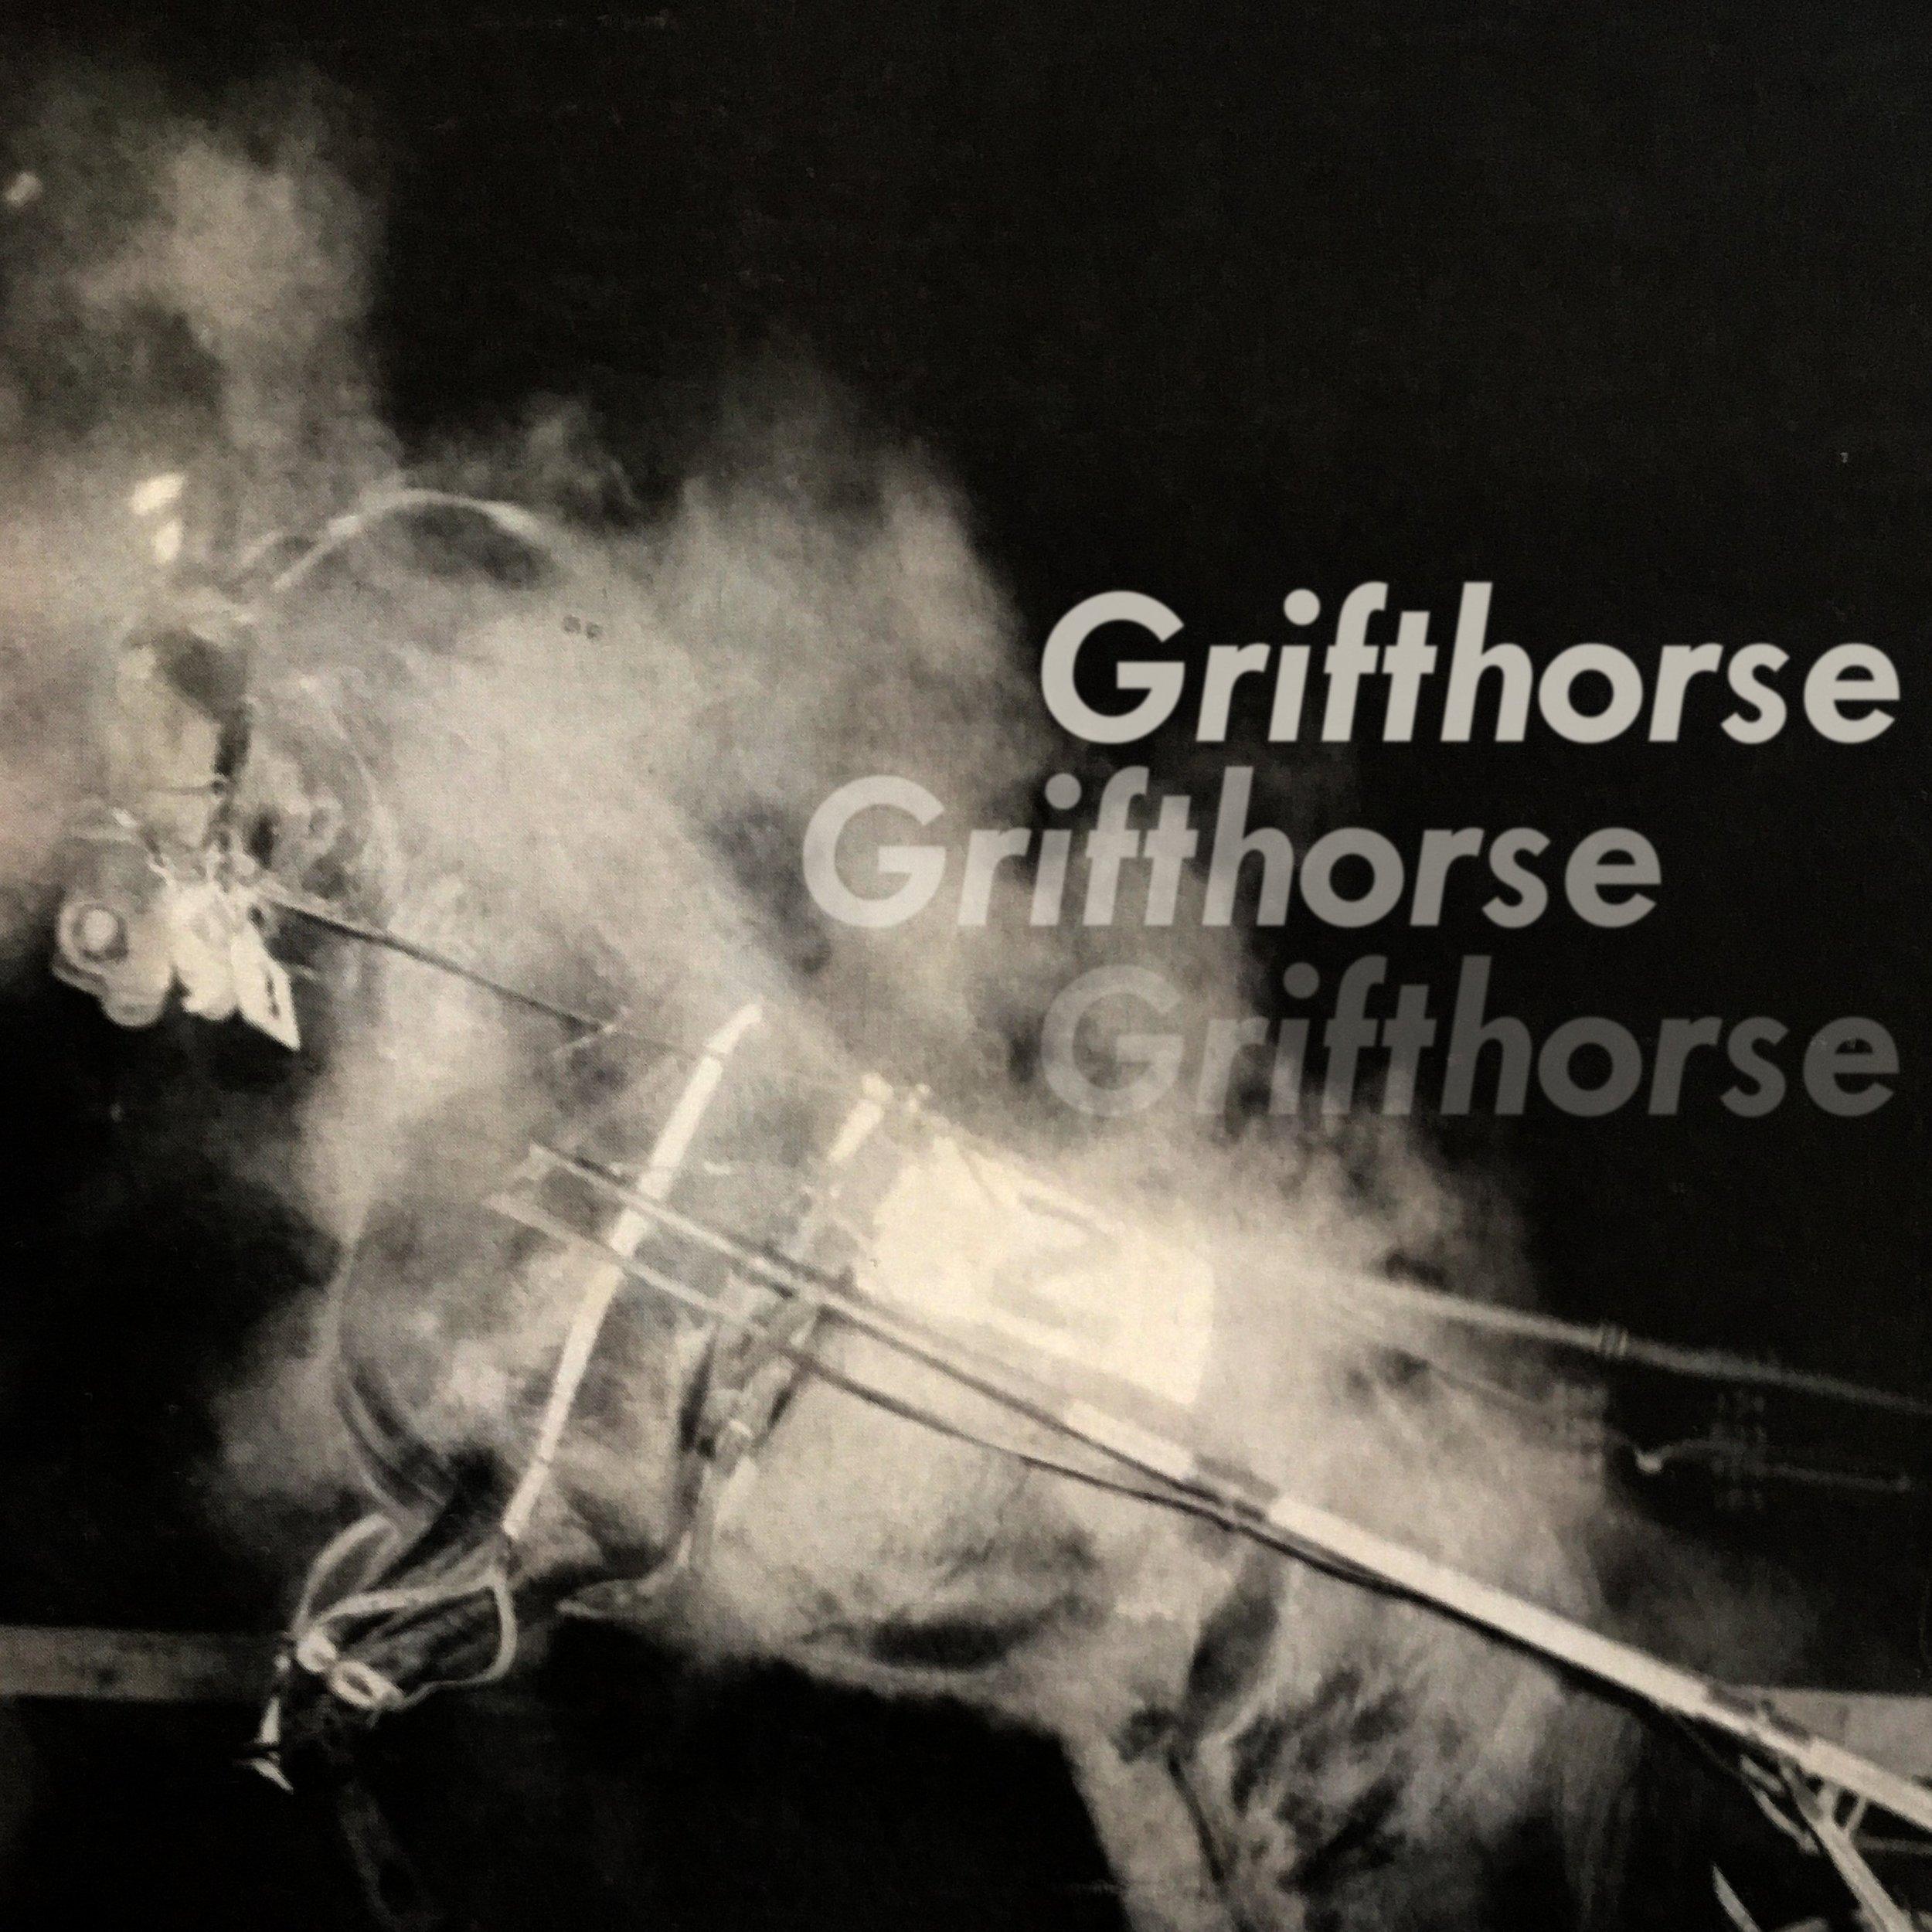 grifthorse.jpeg